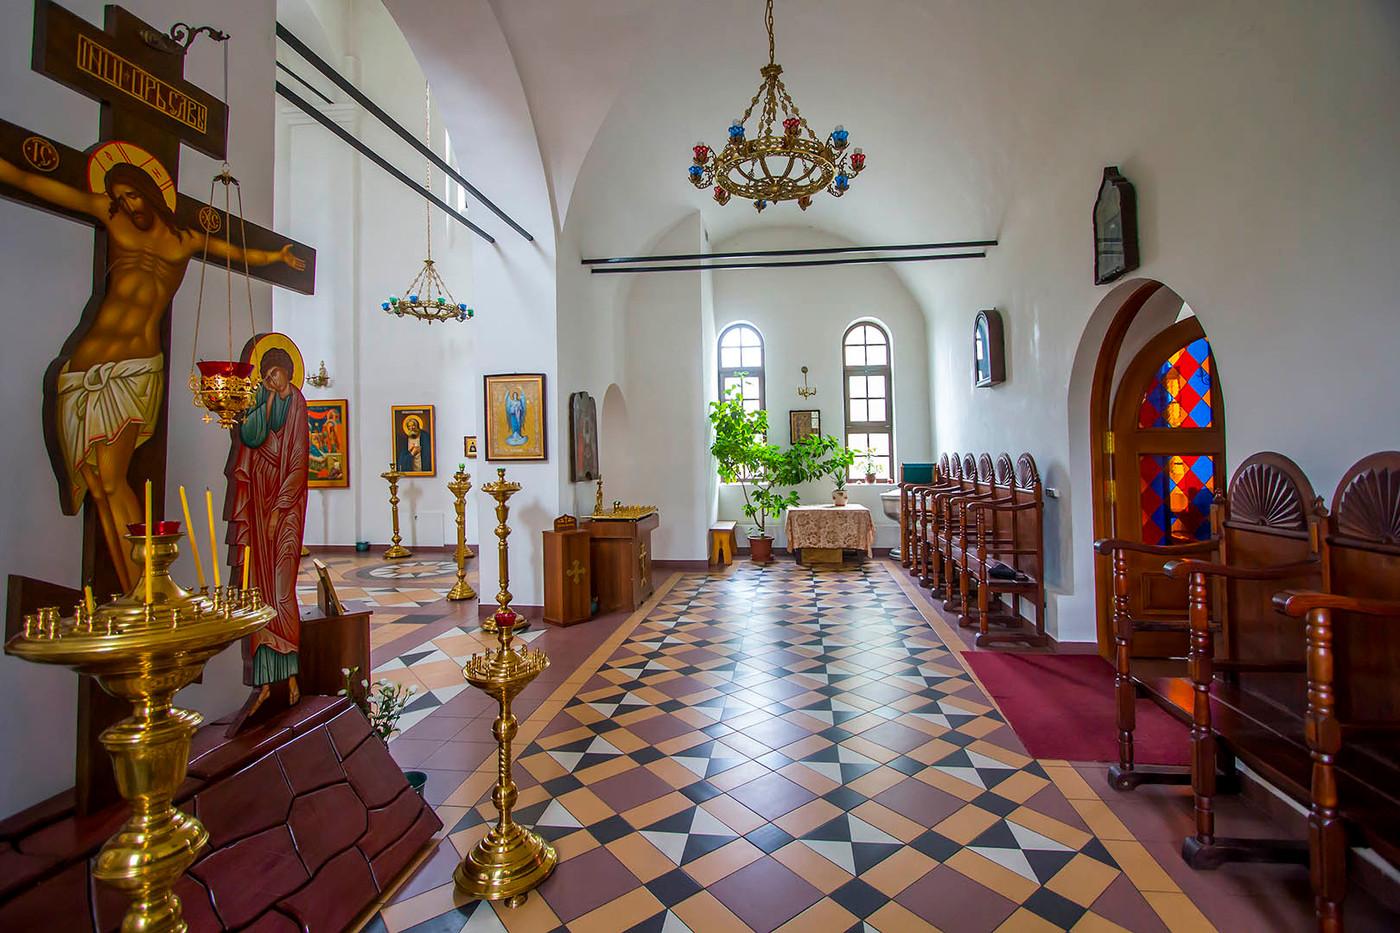 Churilkovo-interior-34.jpg